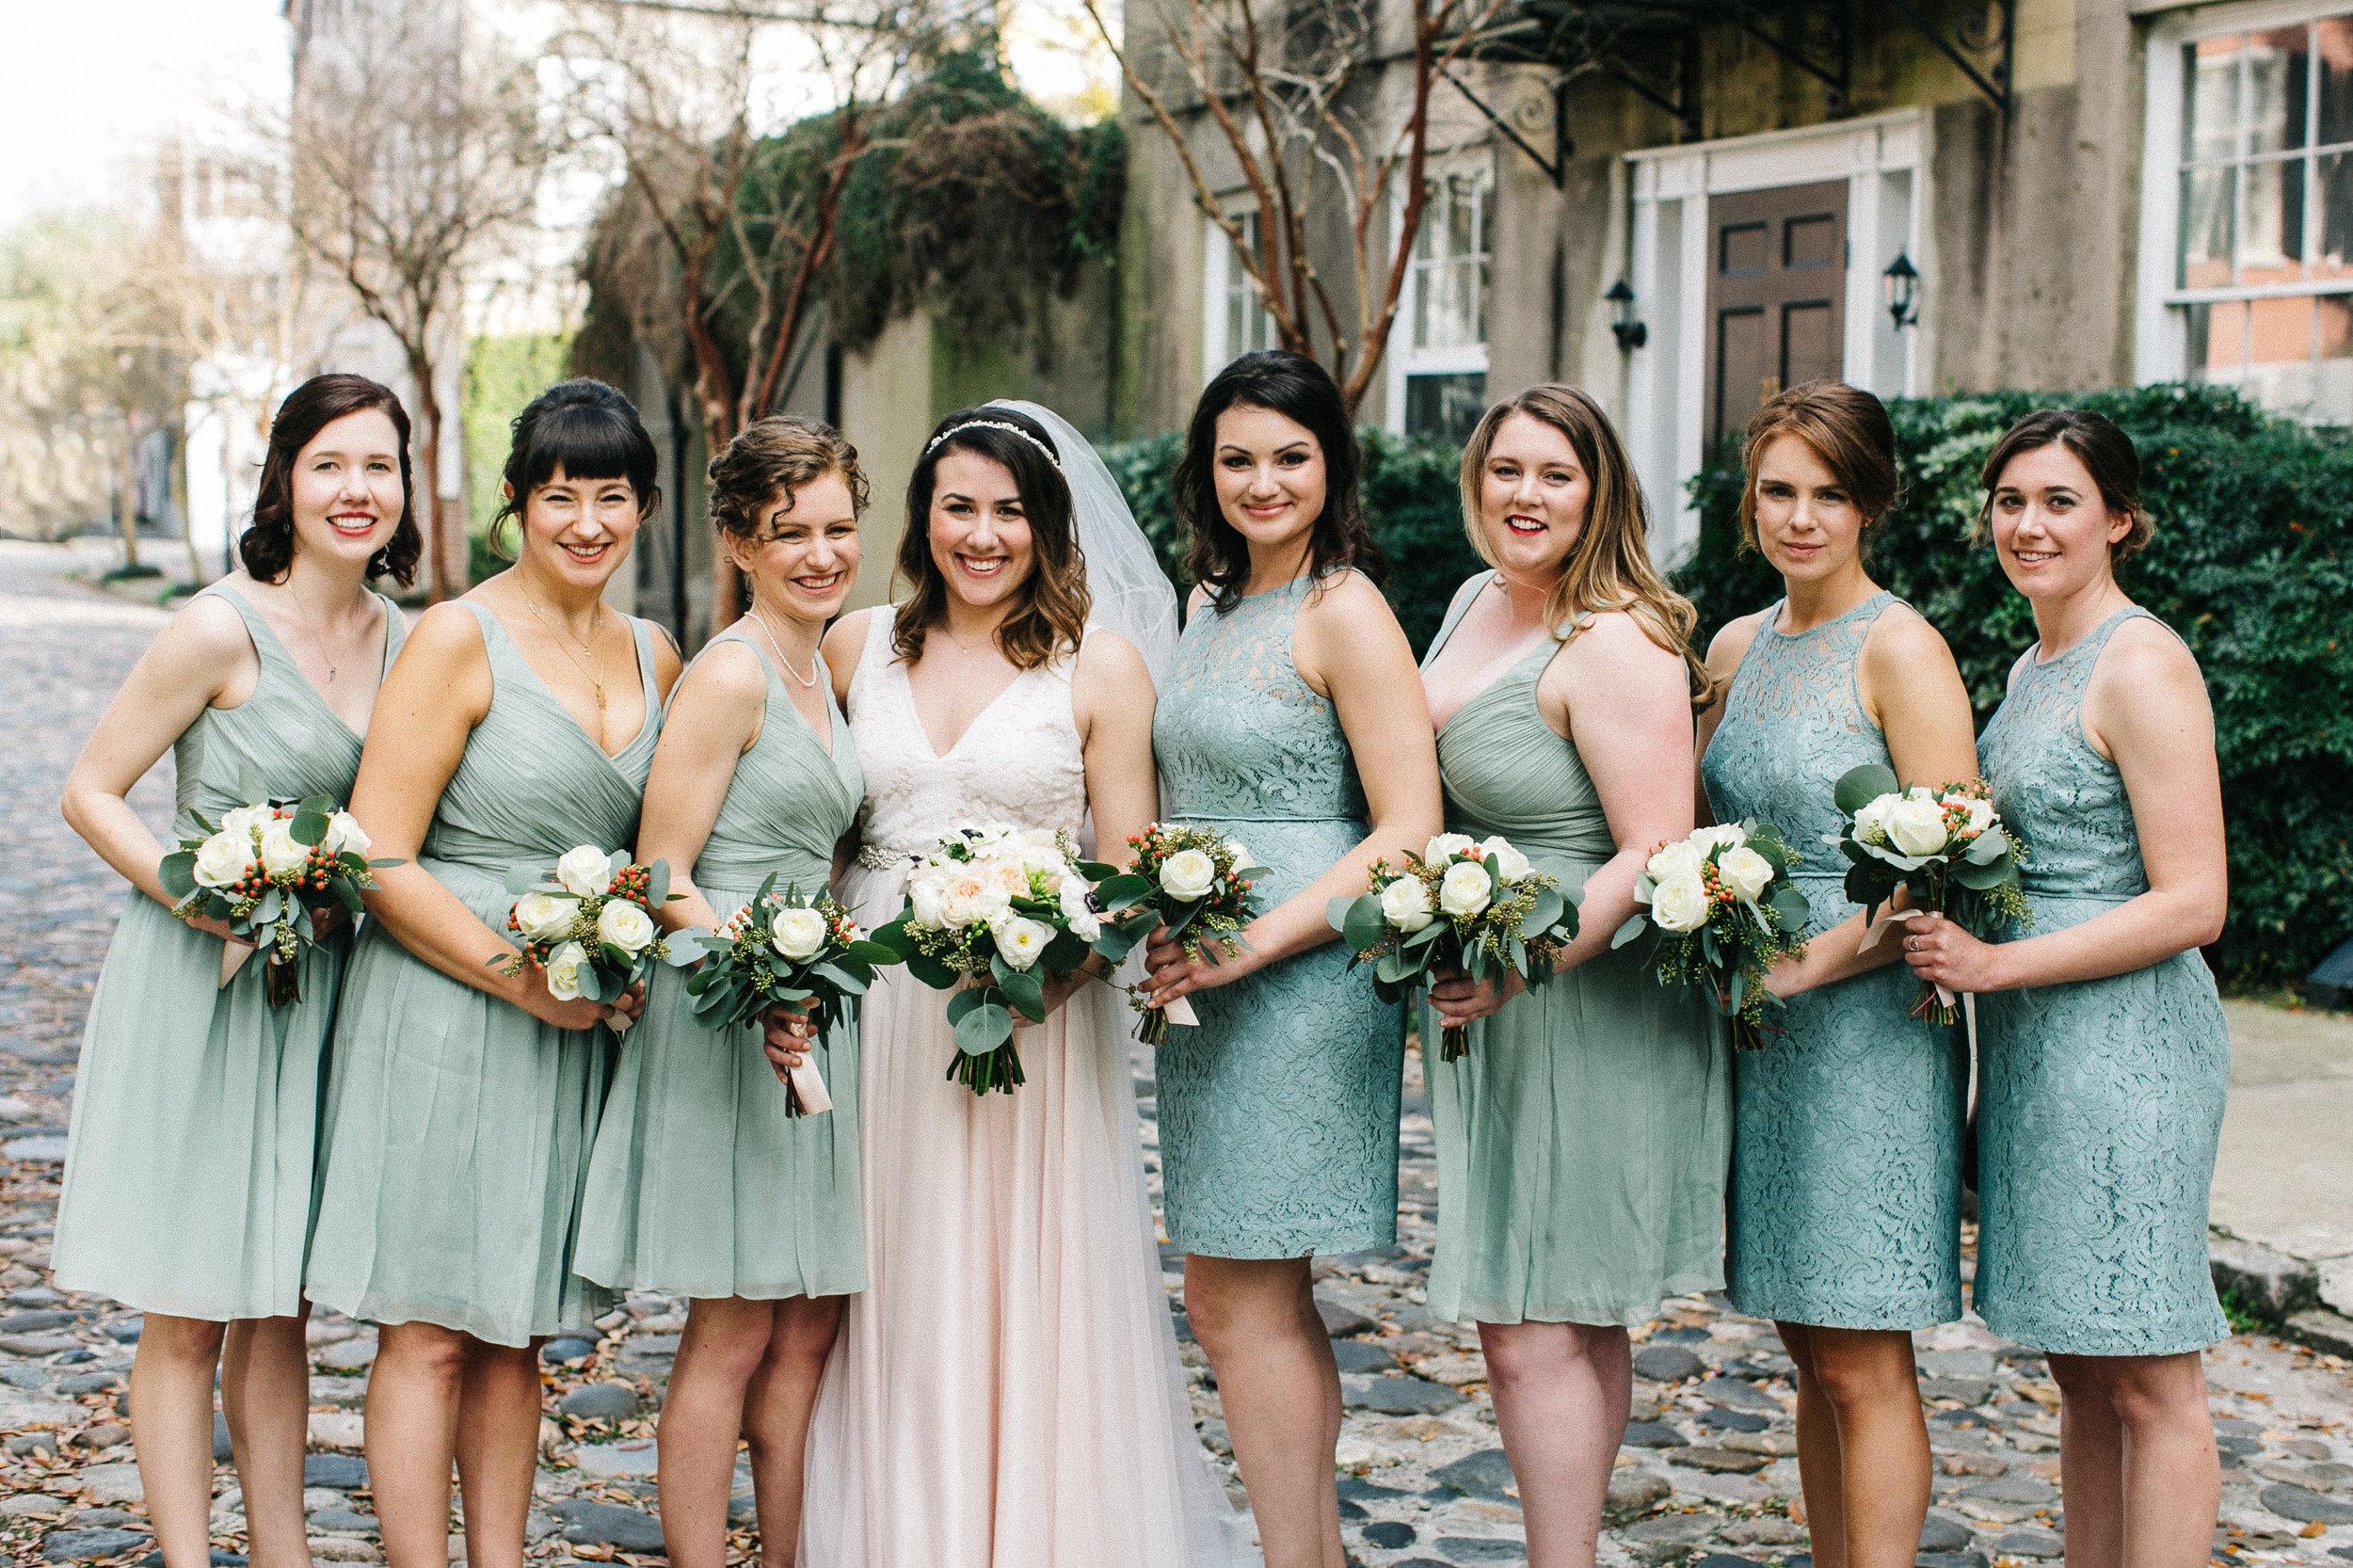 Molly Jeff-Wedding Party-0005.jpg